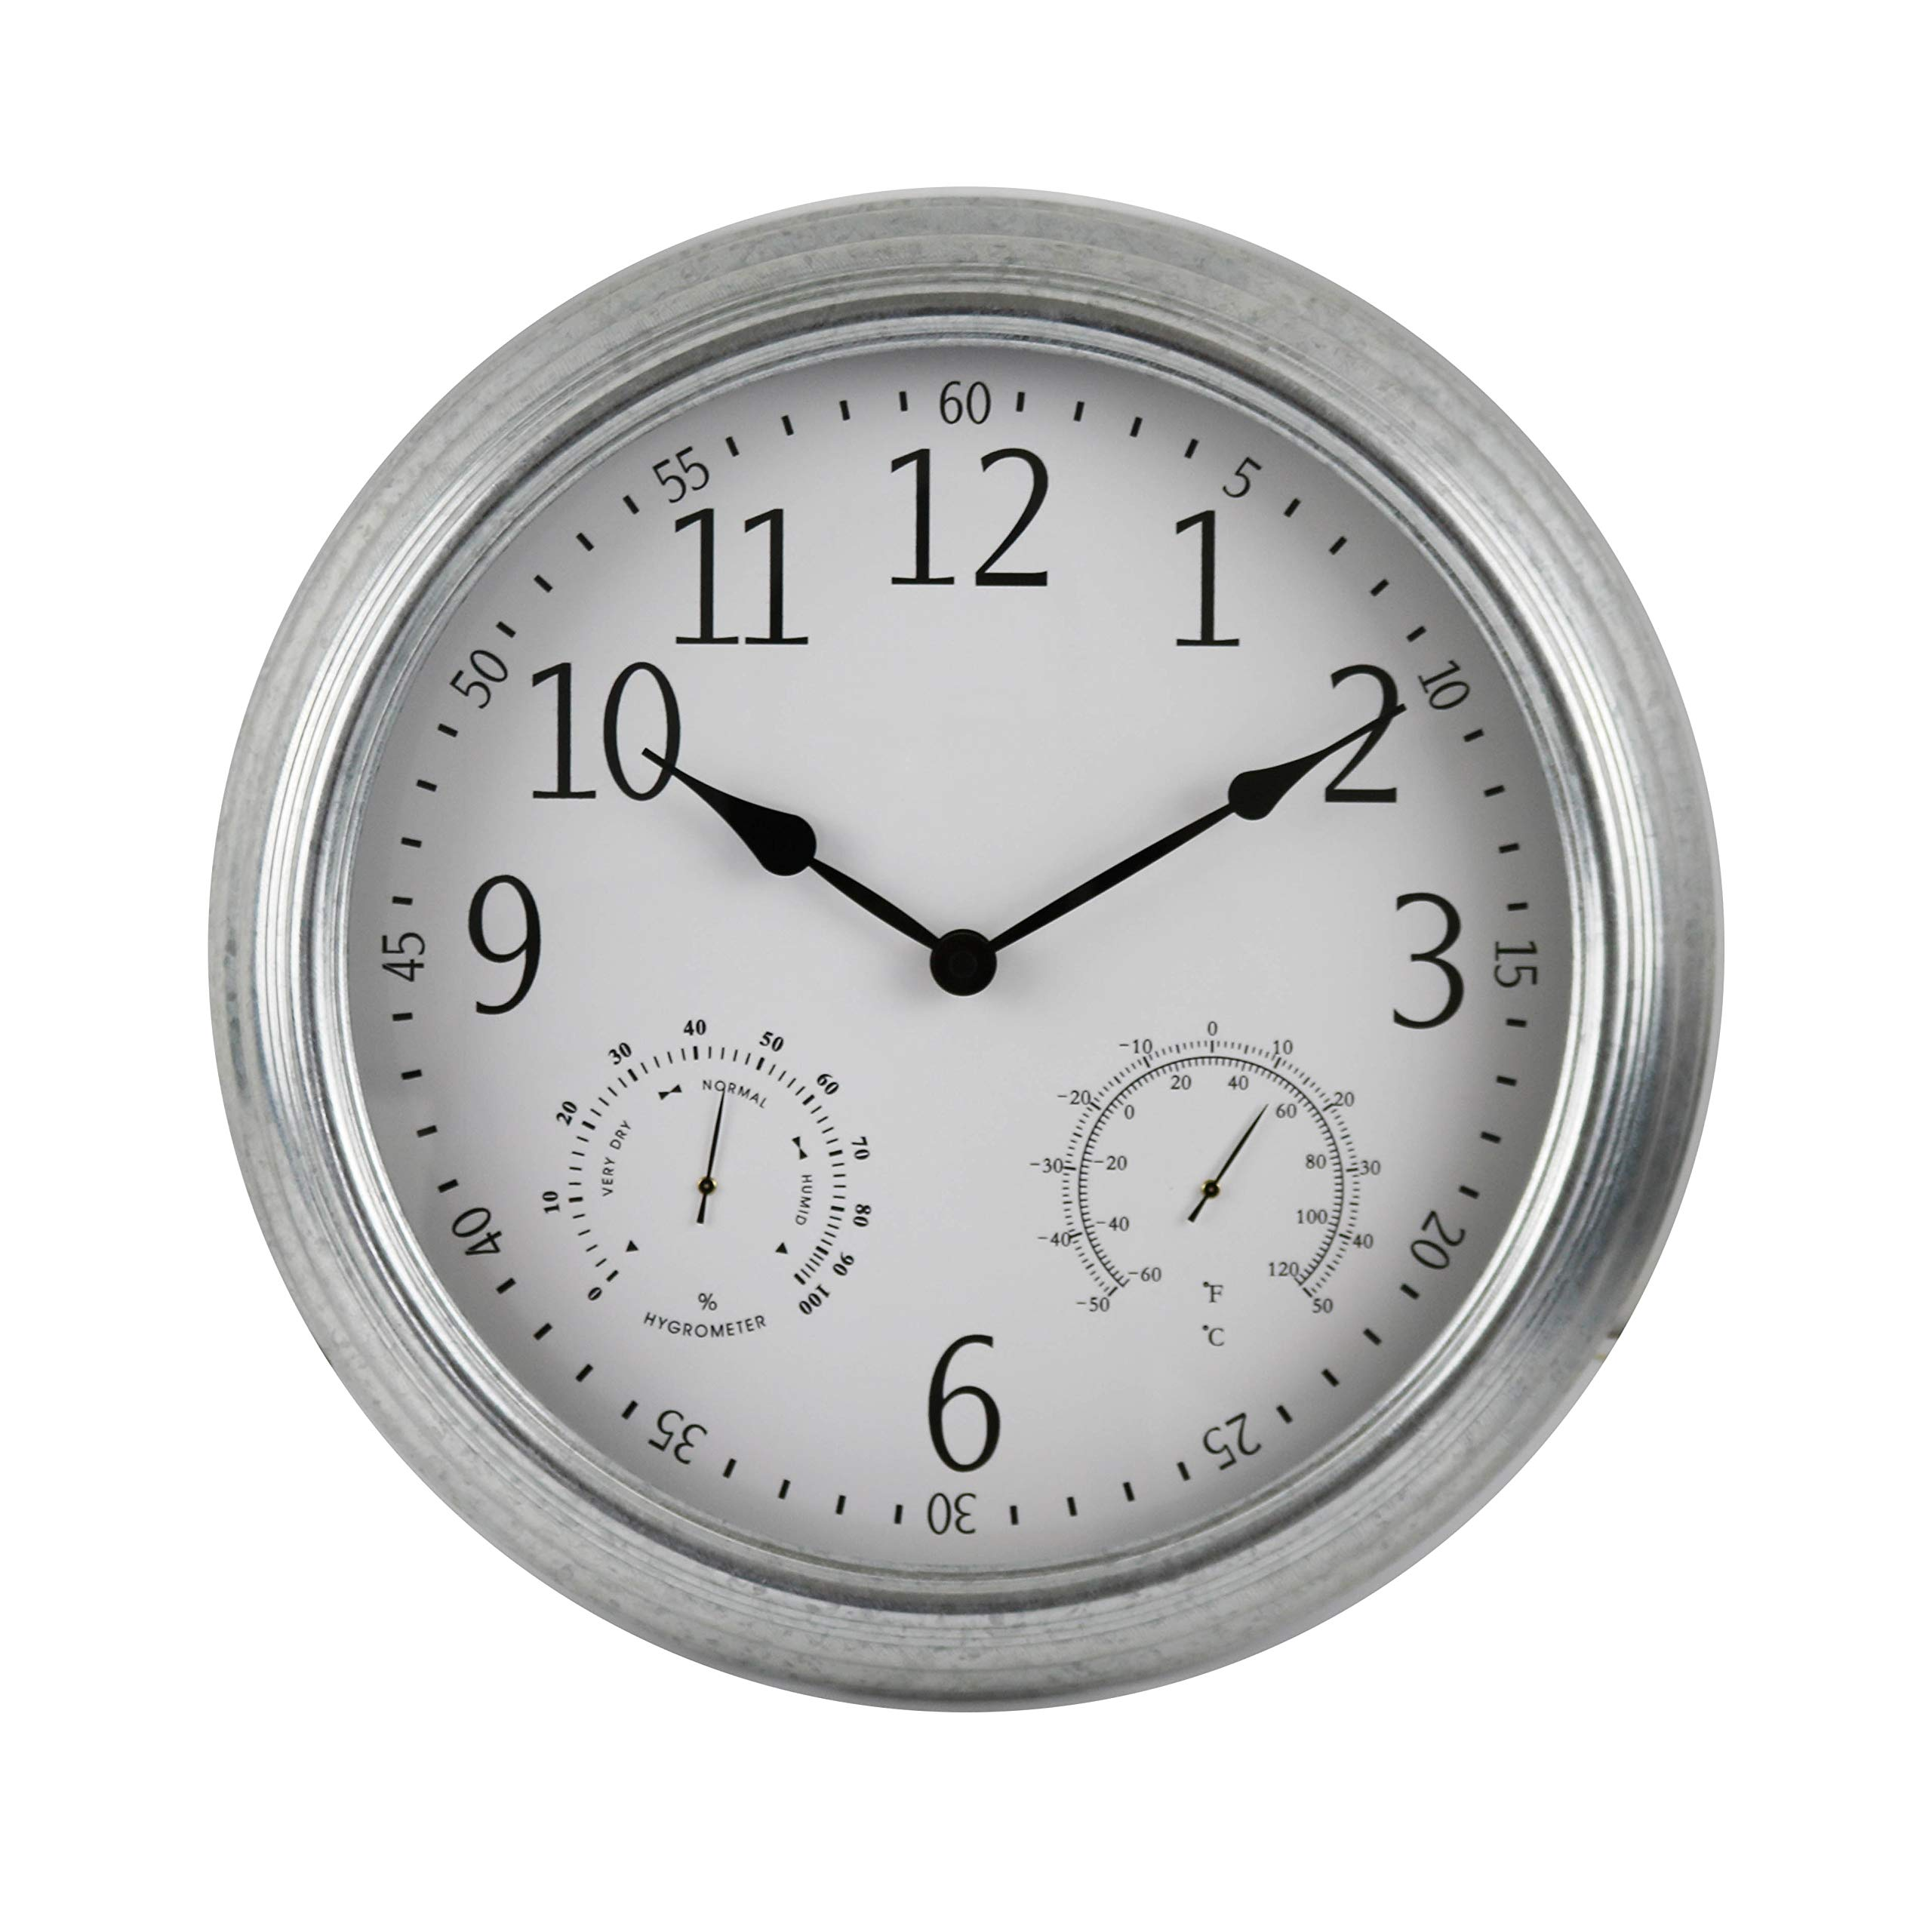 BACKYARD EXPRESSIONS PATIO · HOME · GARDEN 914937 16'' Metal Indoor/Outdoor Weather Monitoring Clock, Silver